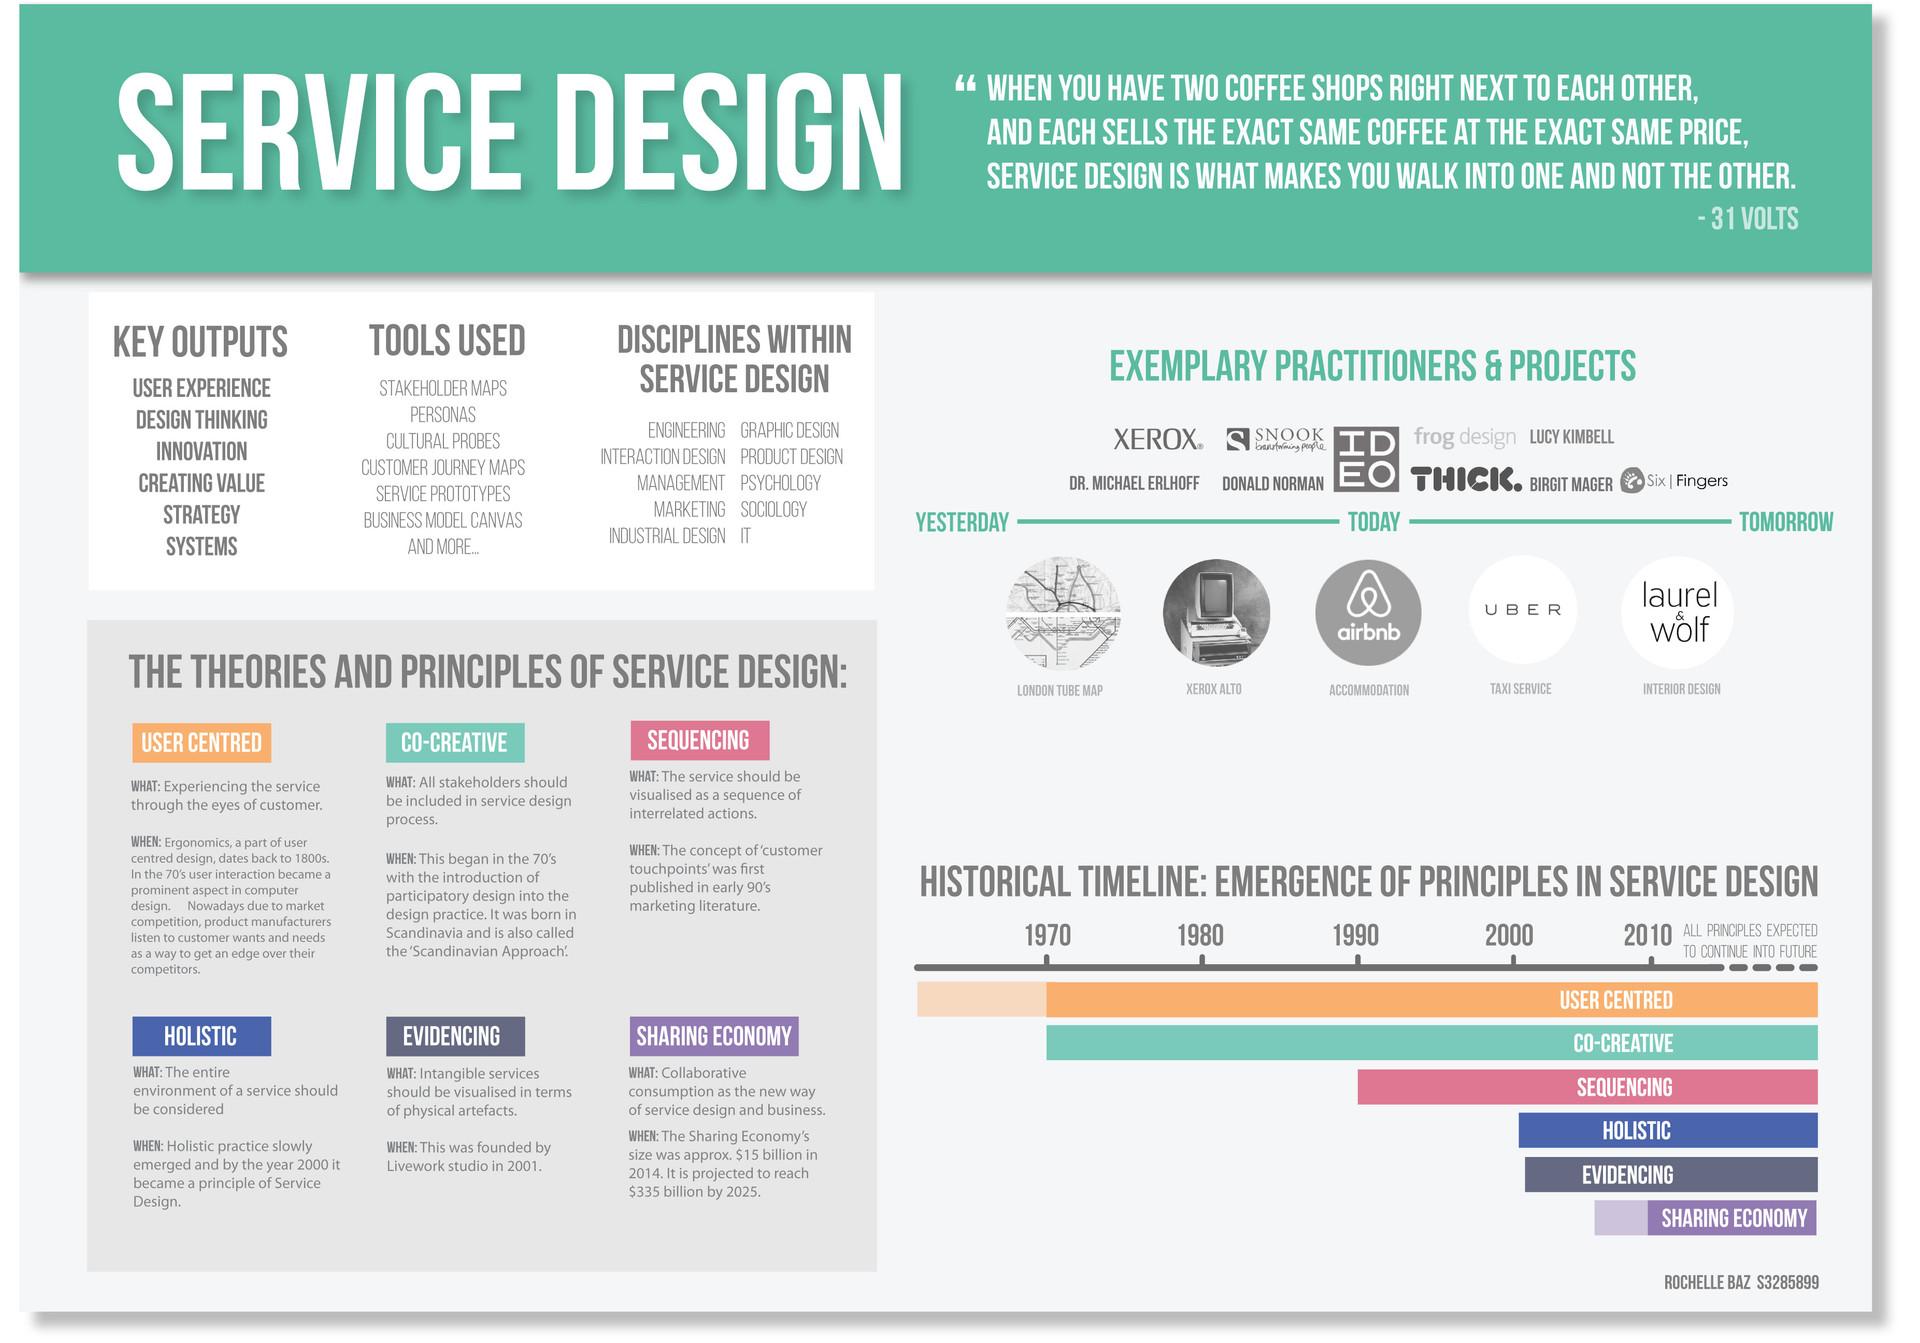 serice design poster.jpg